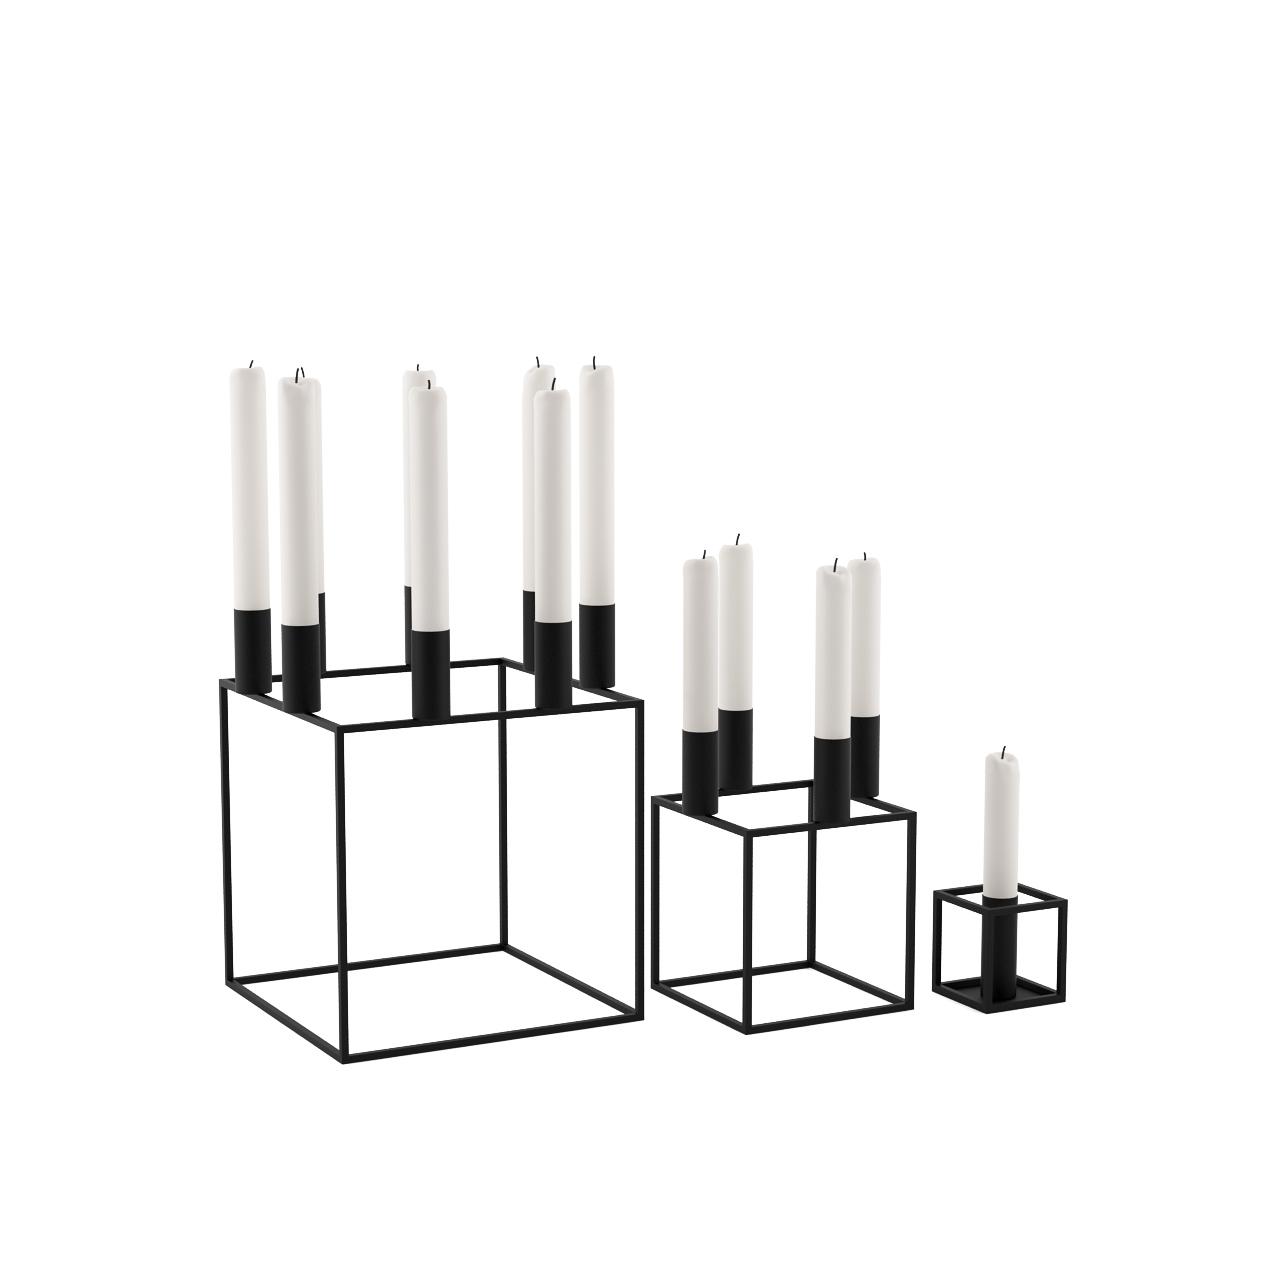 kubus candleholder by lassen dimensiva. Black Bedroom Furniture Sets. Home Design Ideas